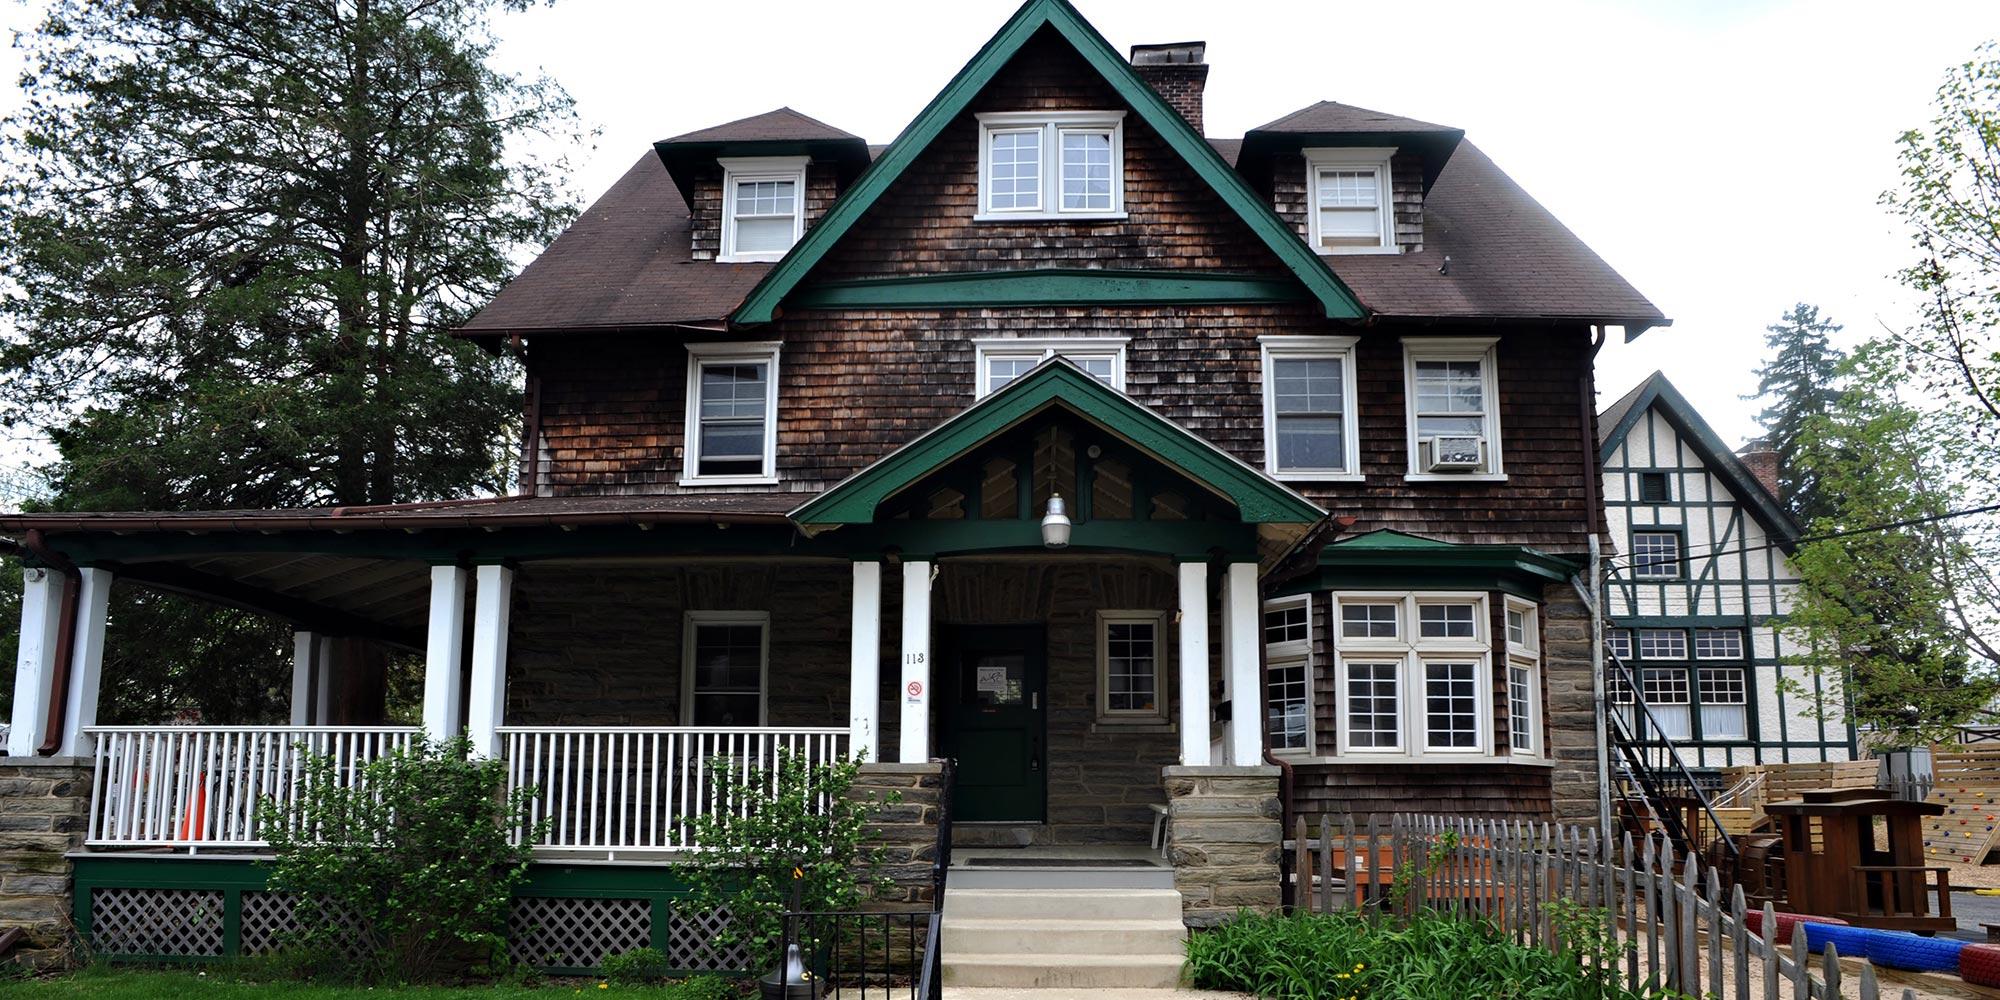 Women's Resource Center in Wayne, PA